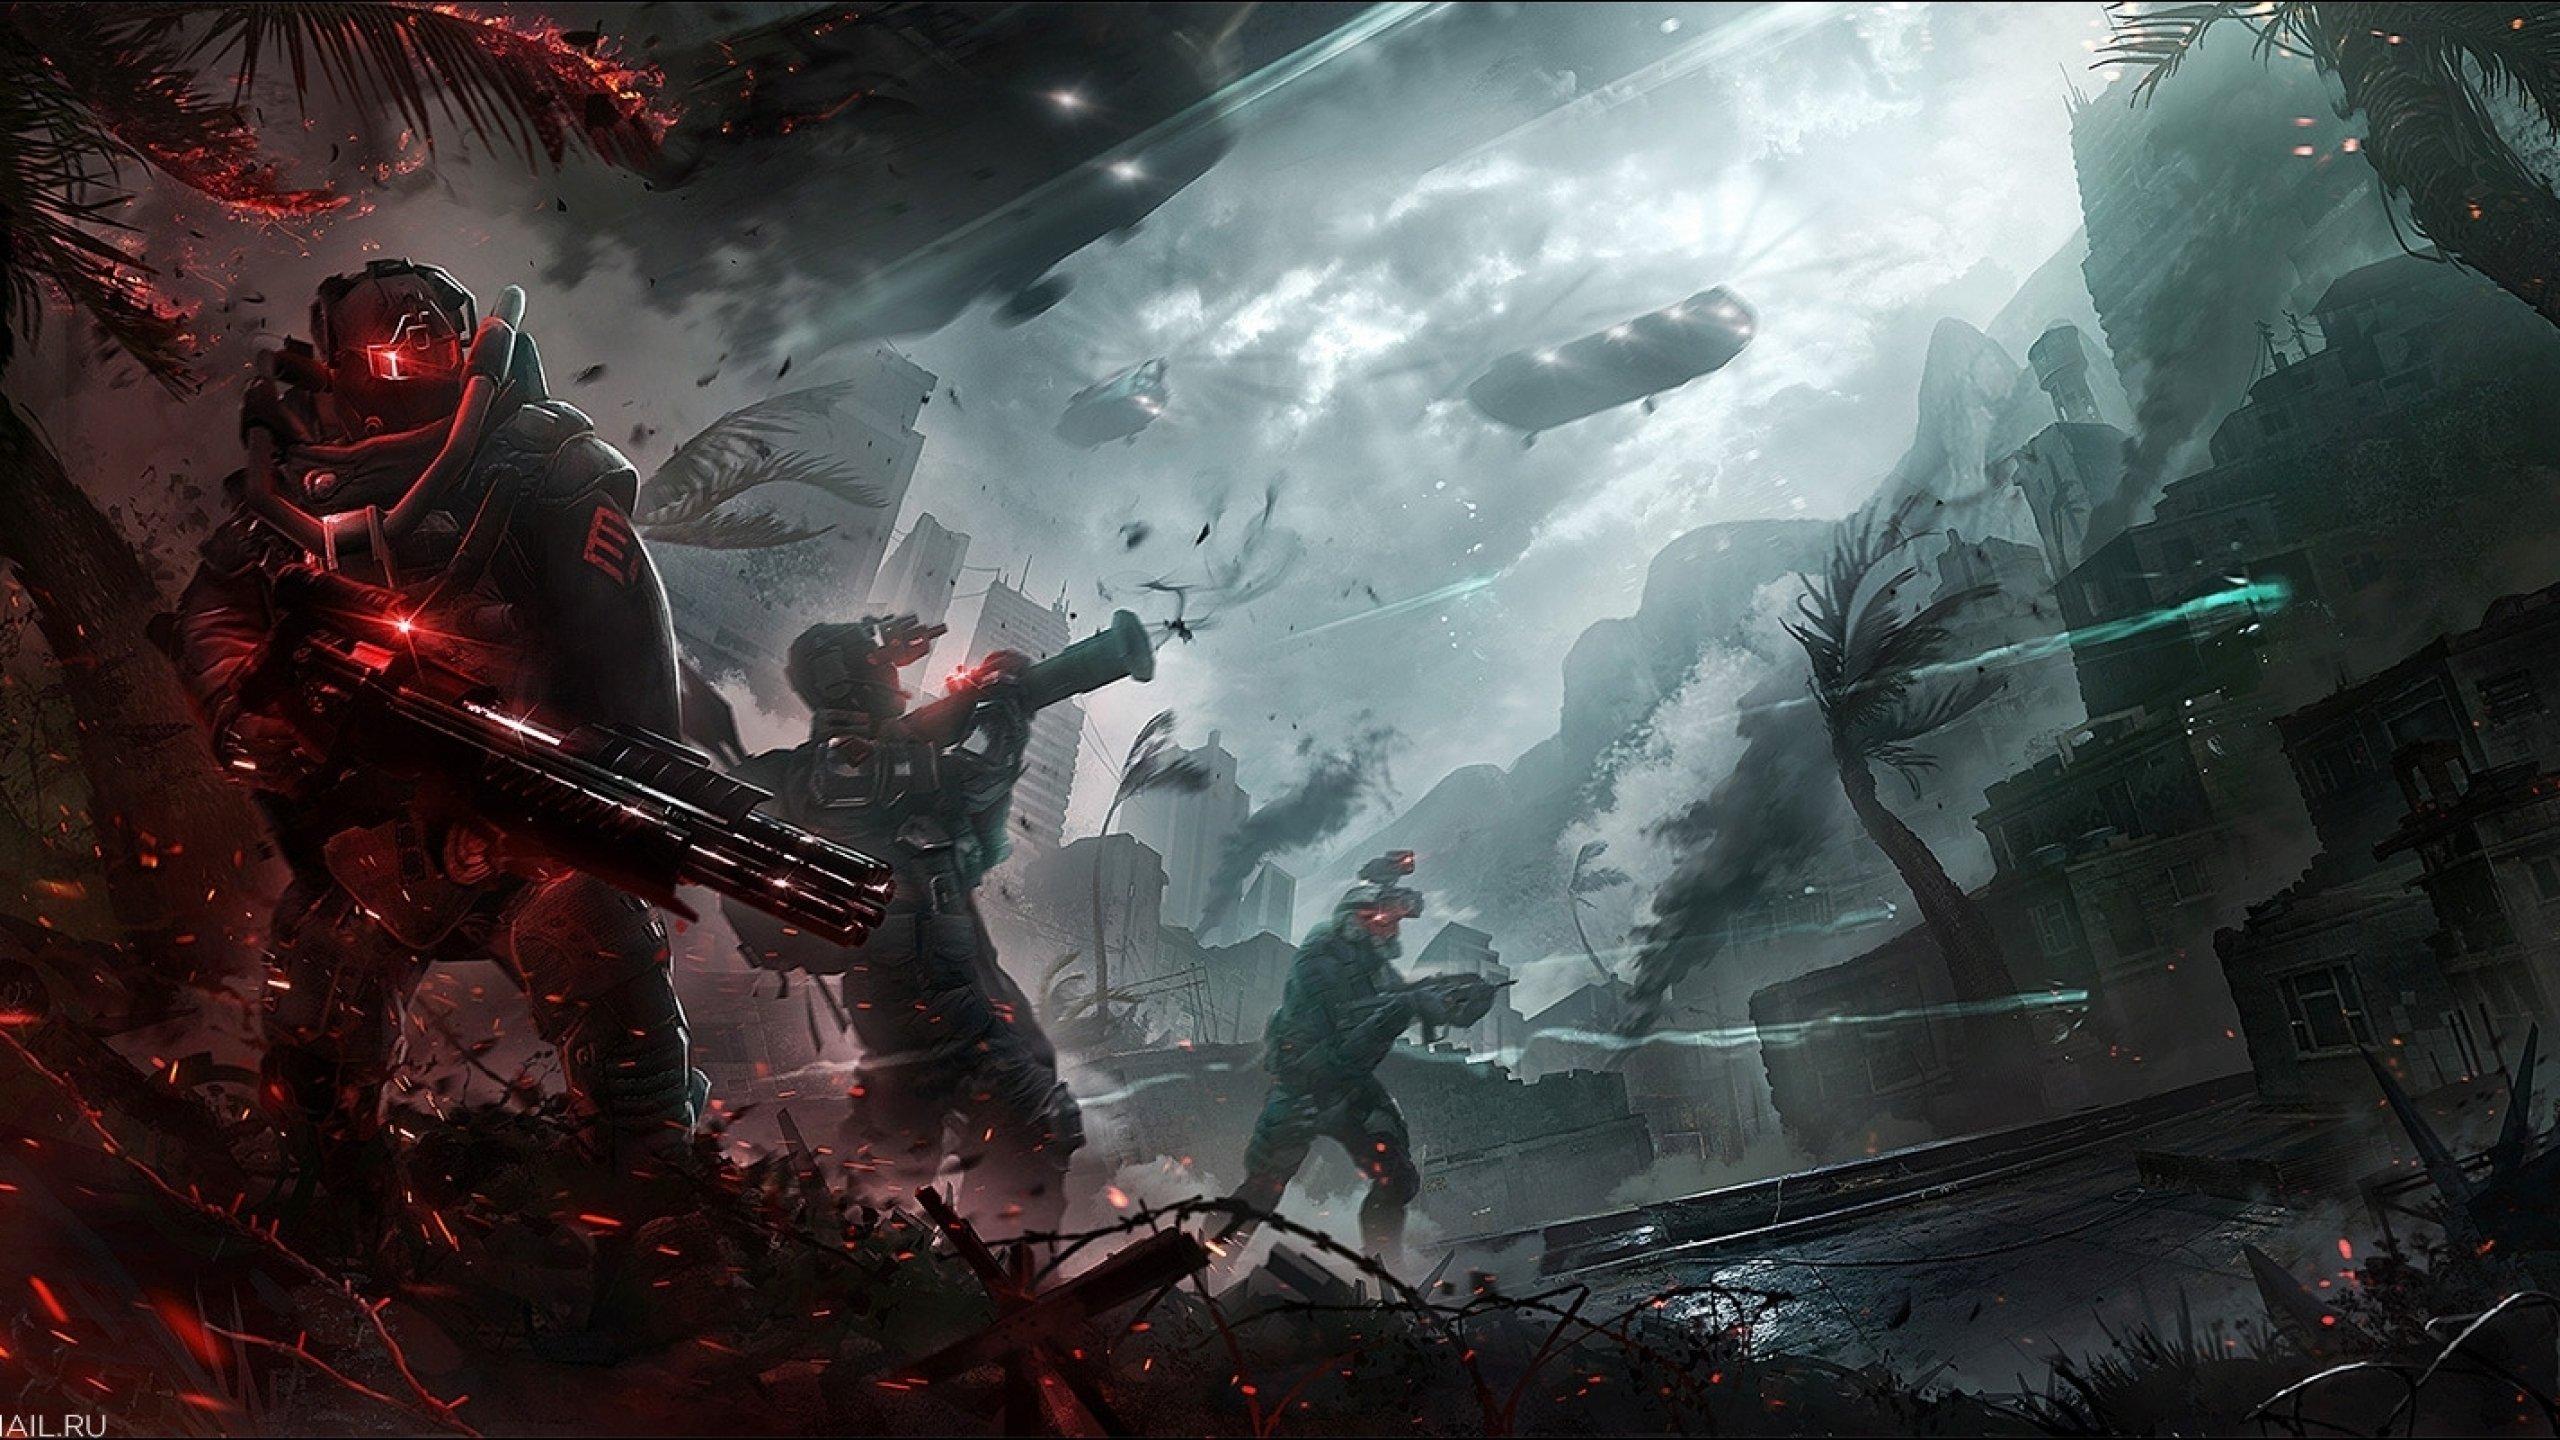 fighting war art artwork warrior futuristic spaceship space wallpaper 2560x1440